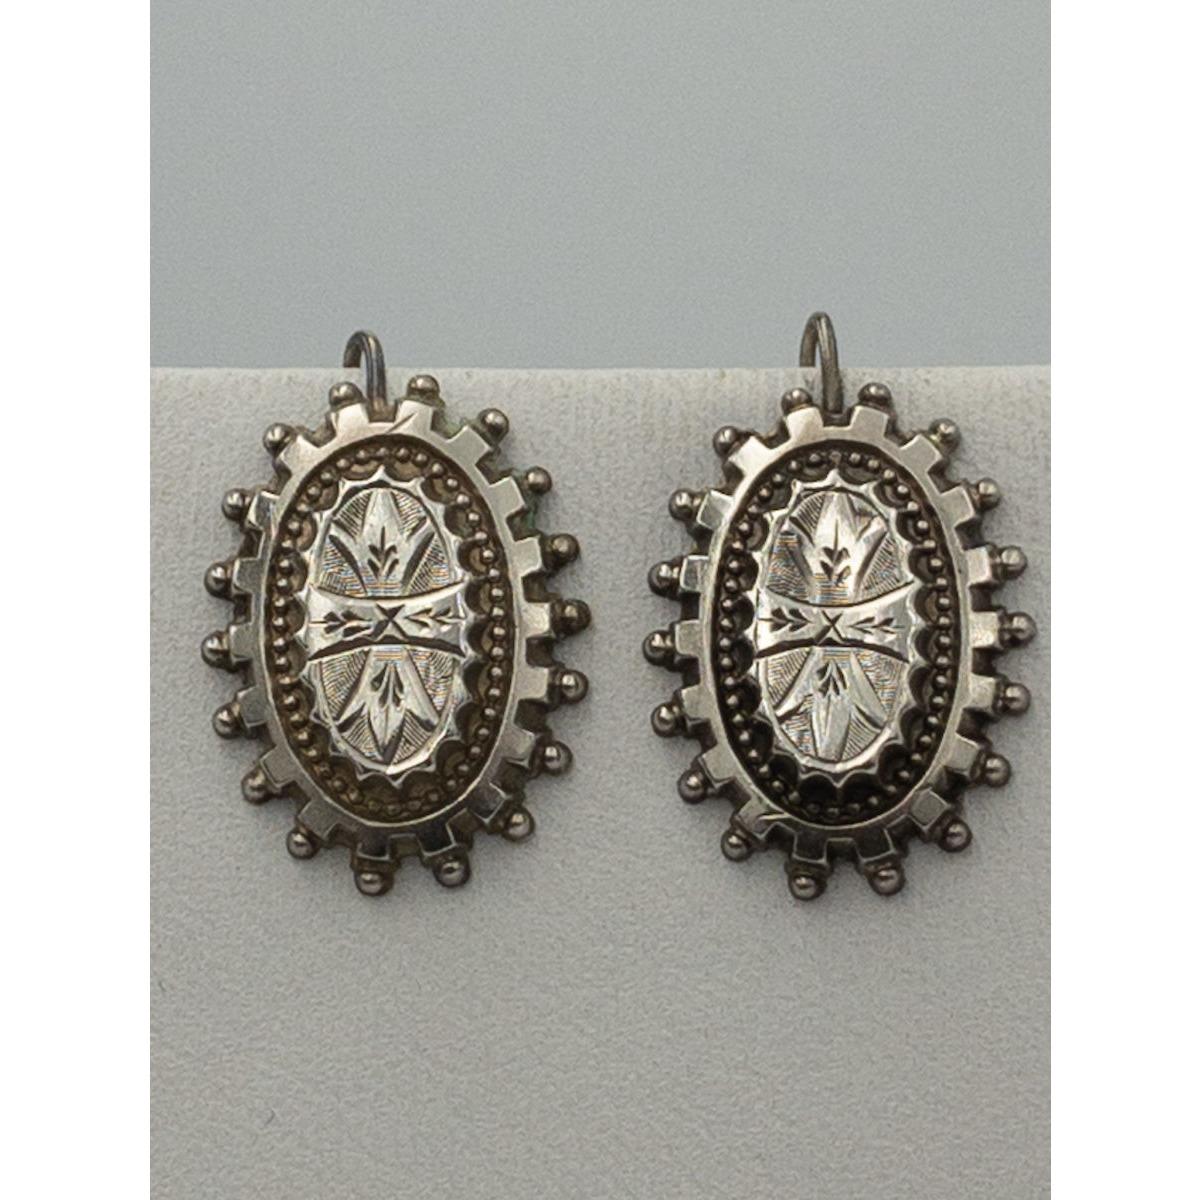 Double Beaded Border, Exterior Balls, Geometric Central Design Antique English Silver Earrings